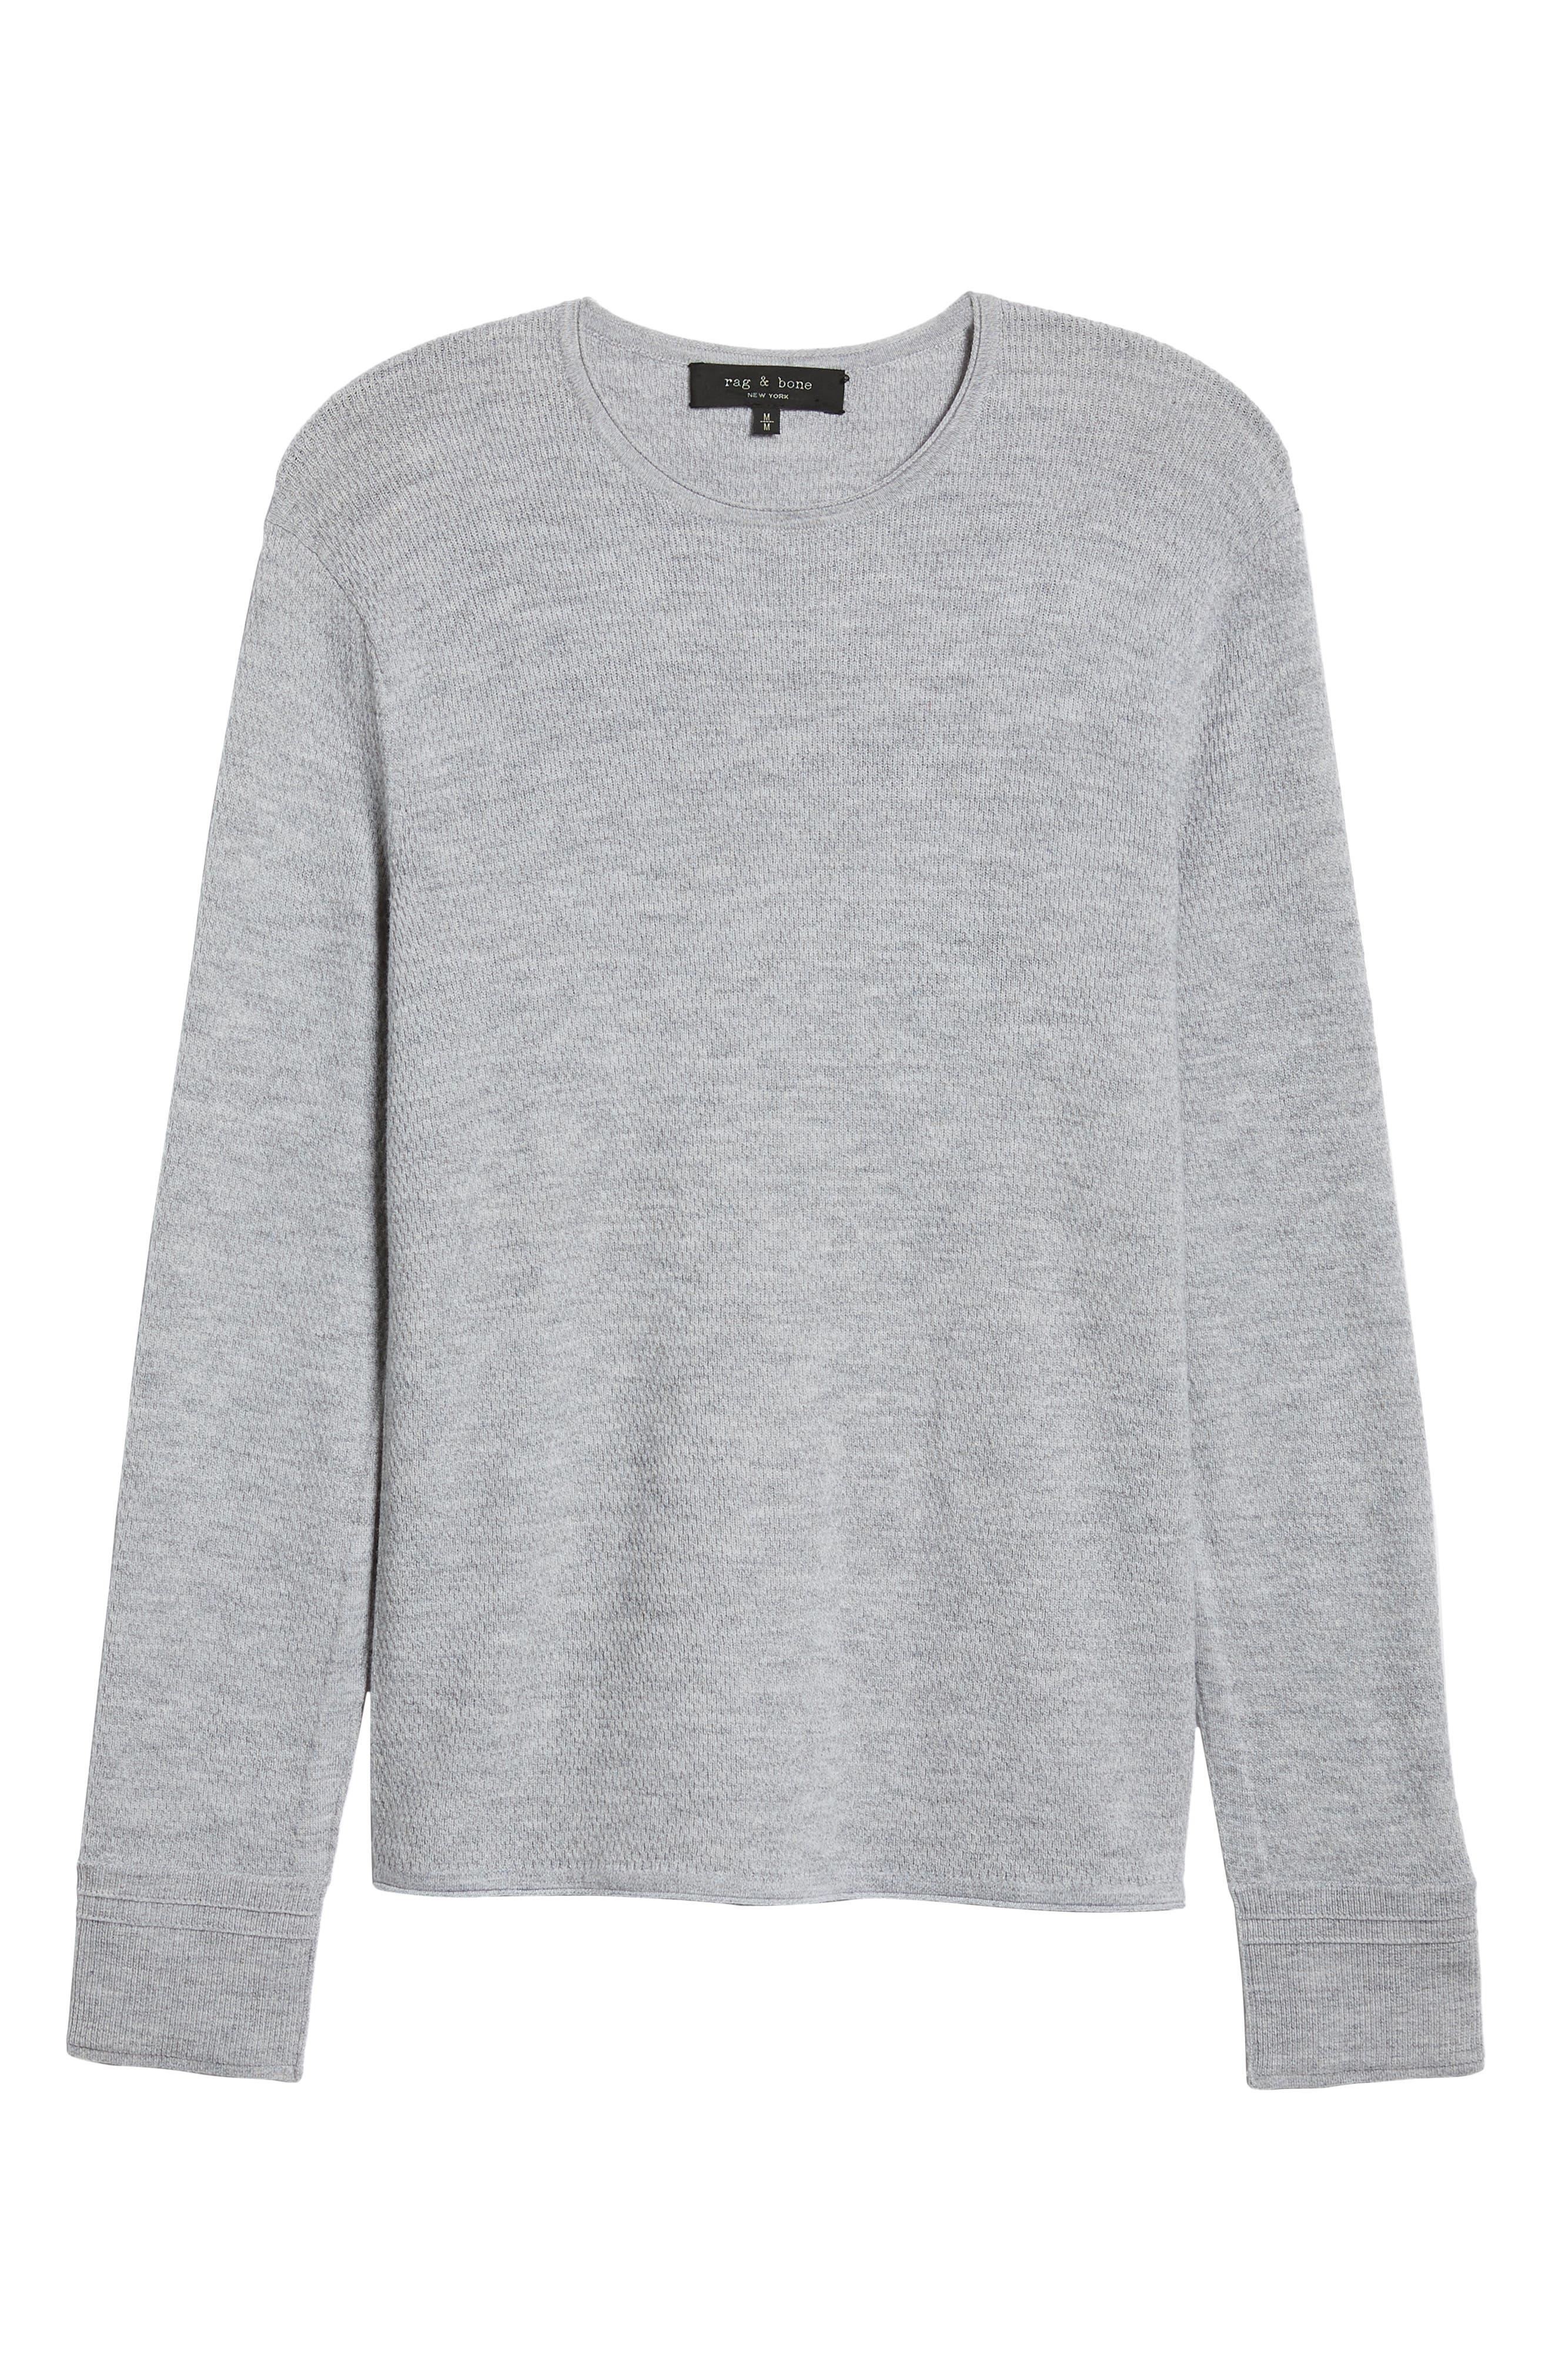 Gregory Merino Wool Blend Crewneck Sweater,                             Alternate thumbnail 6, color,                             GREY